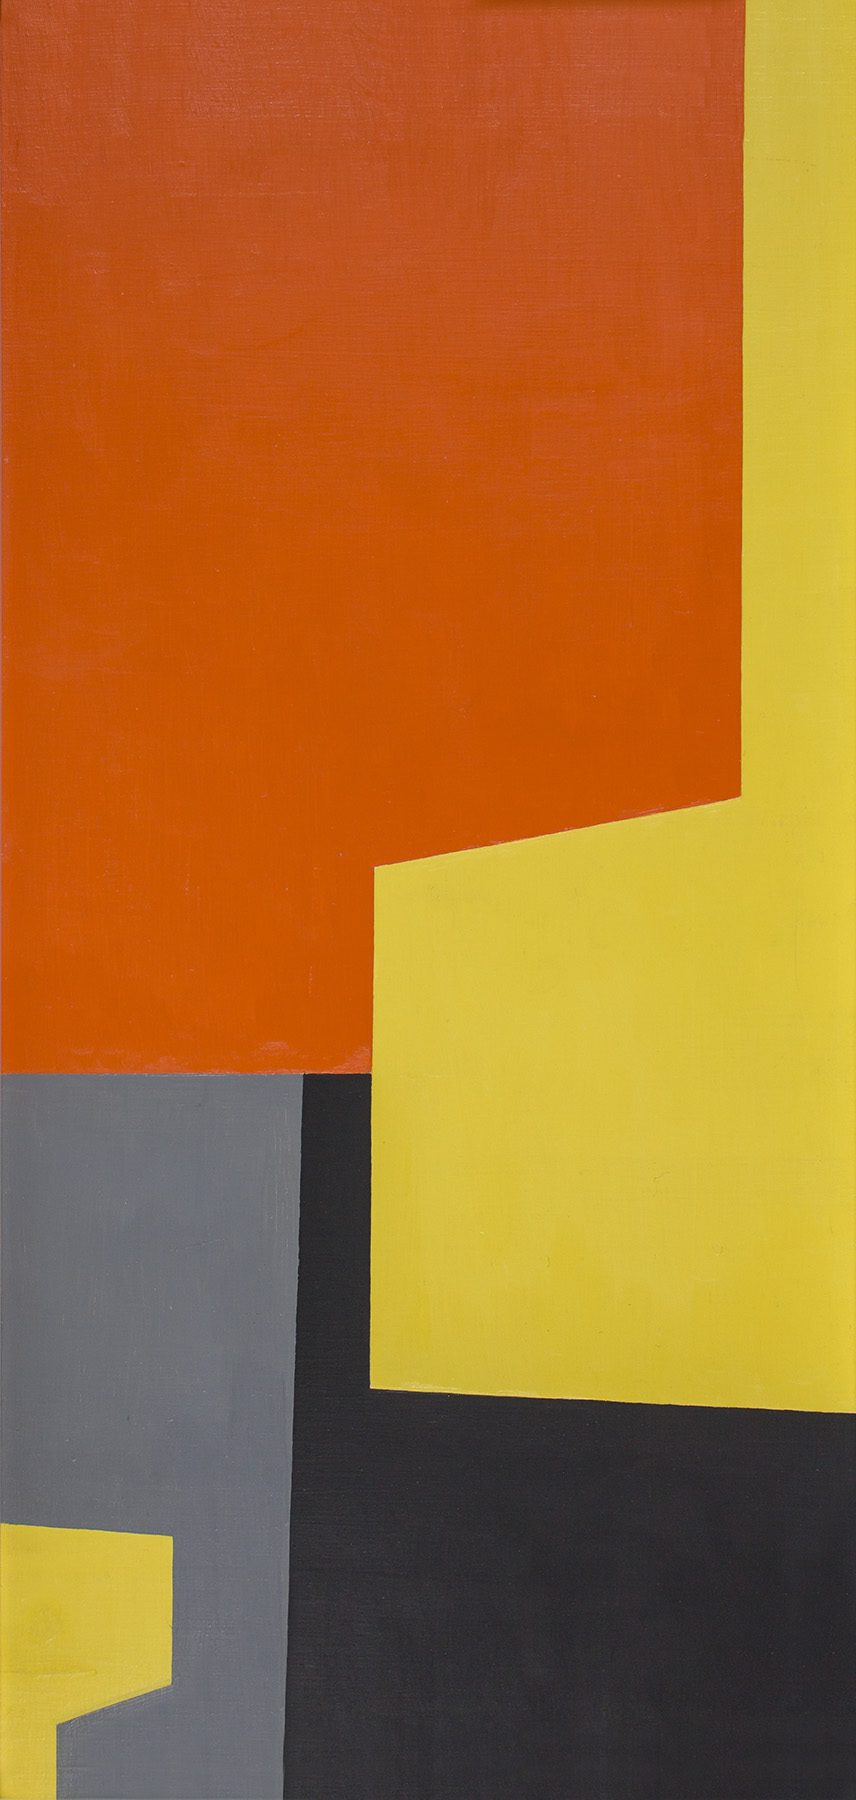 Christian Roeckenschuss | K517, 38 x 79 cm, 1955, Holz farbig gefasst